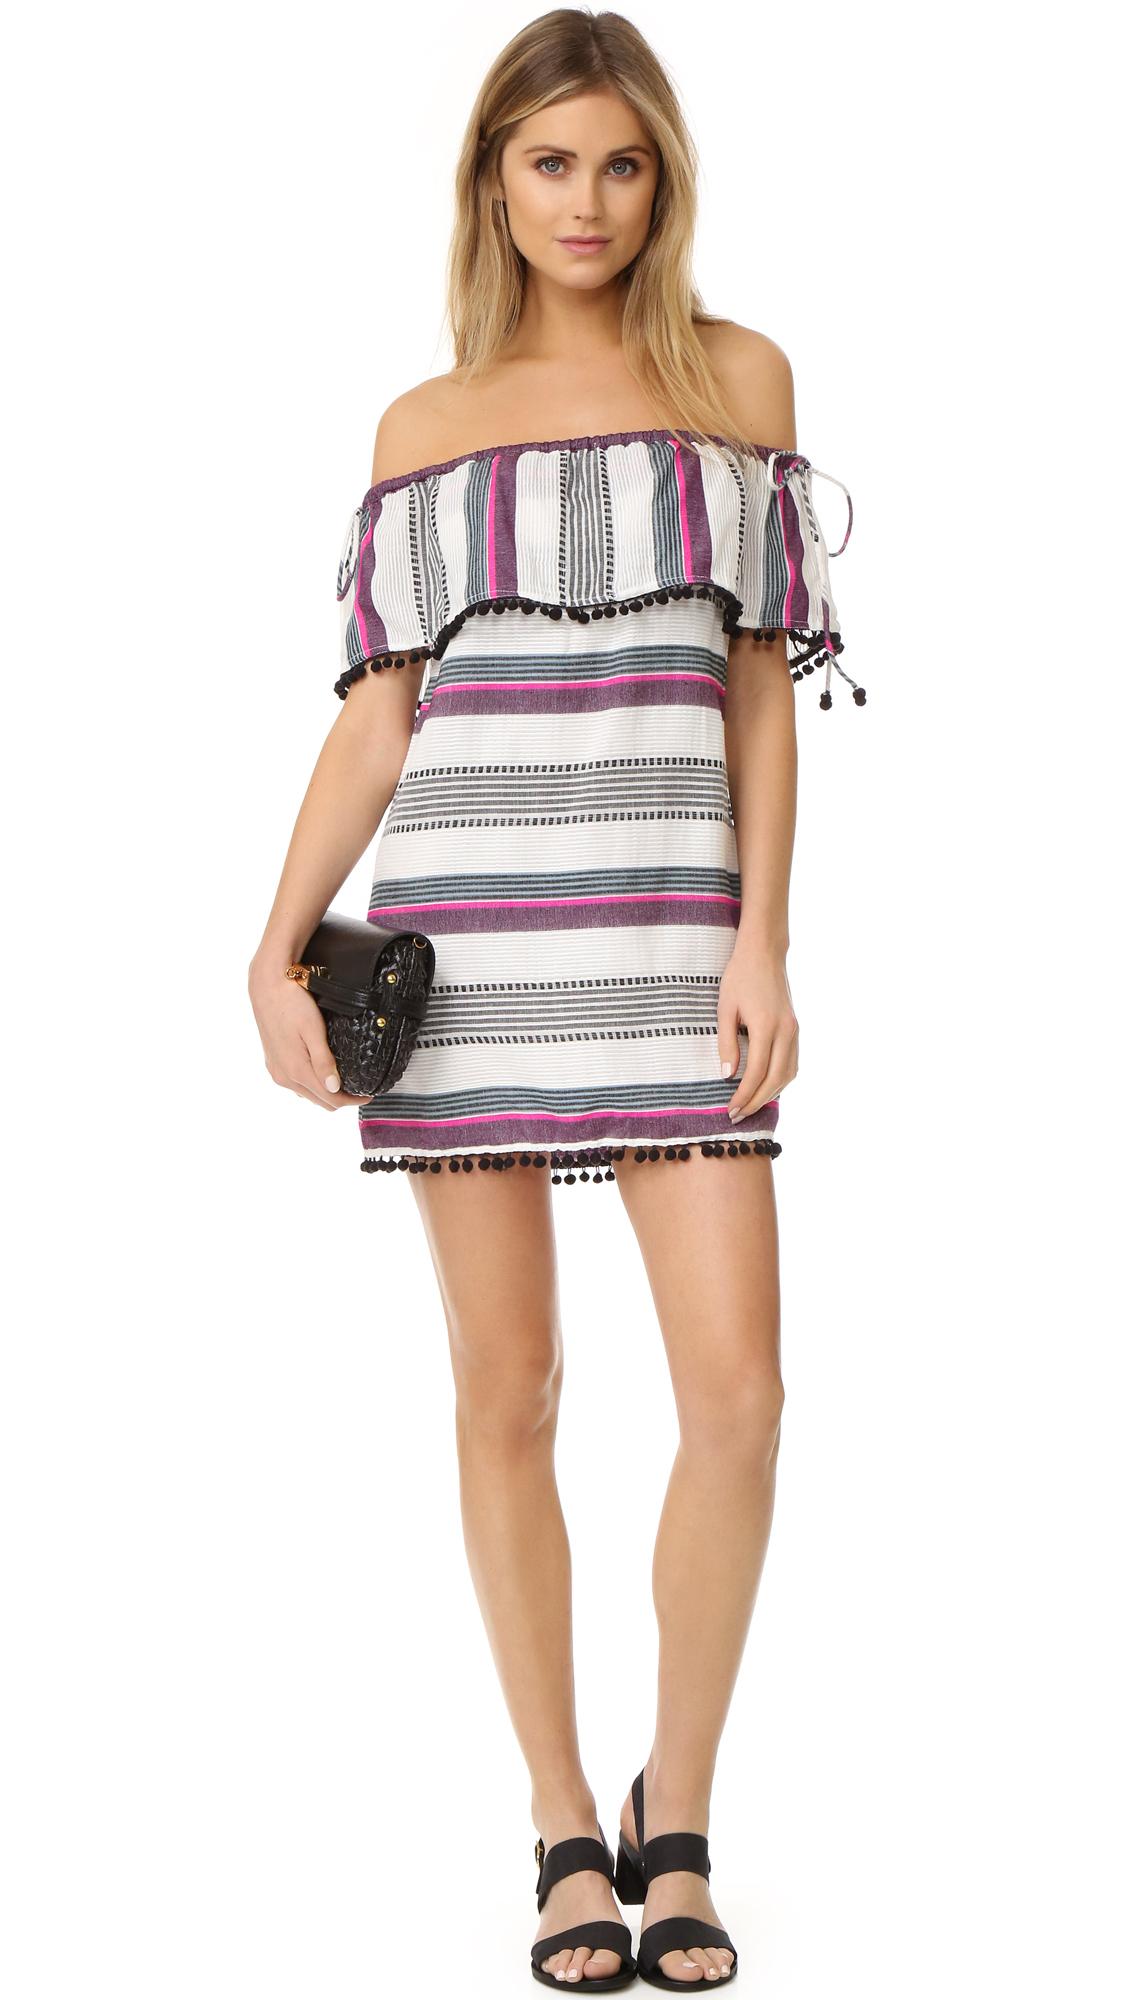 c3b4973768fd Saylor Angie Off Shoulder Mini Dress